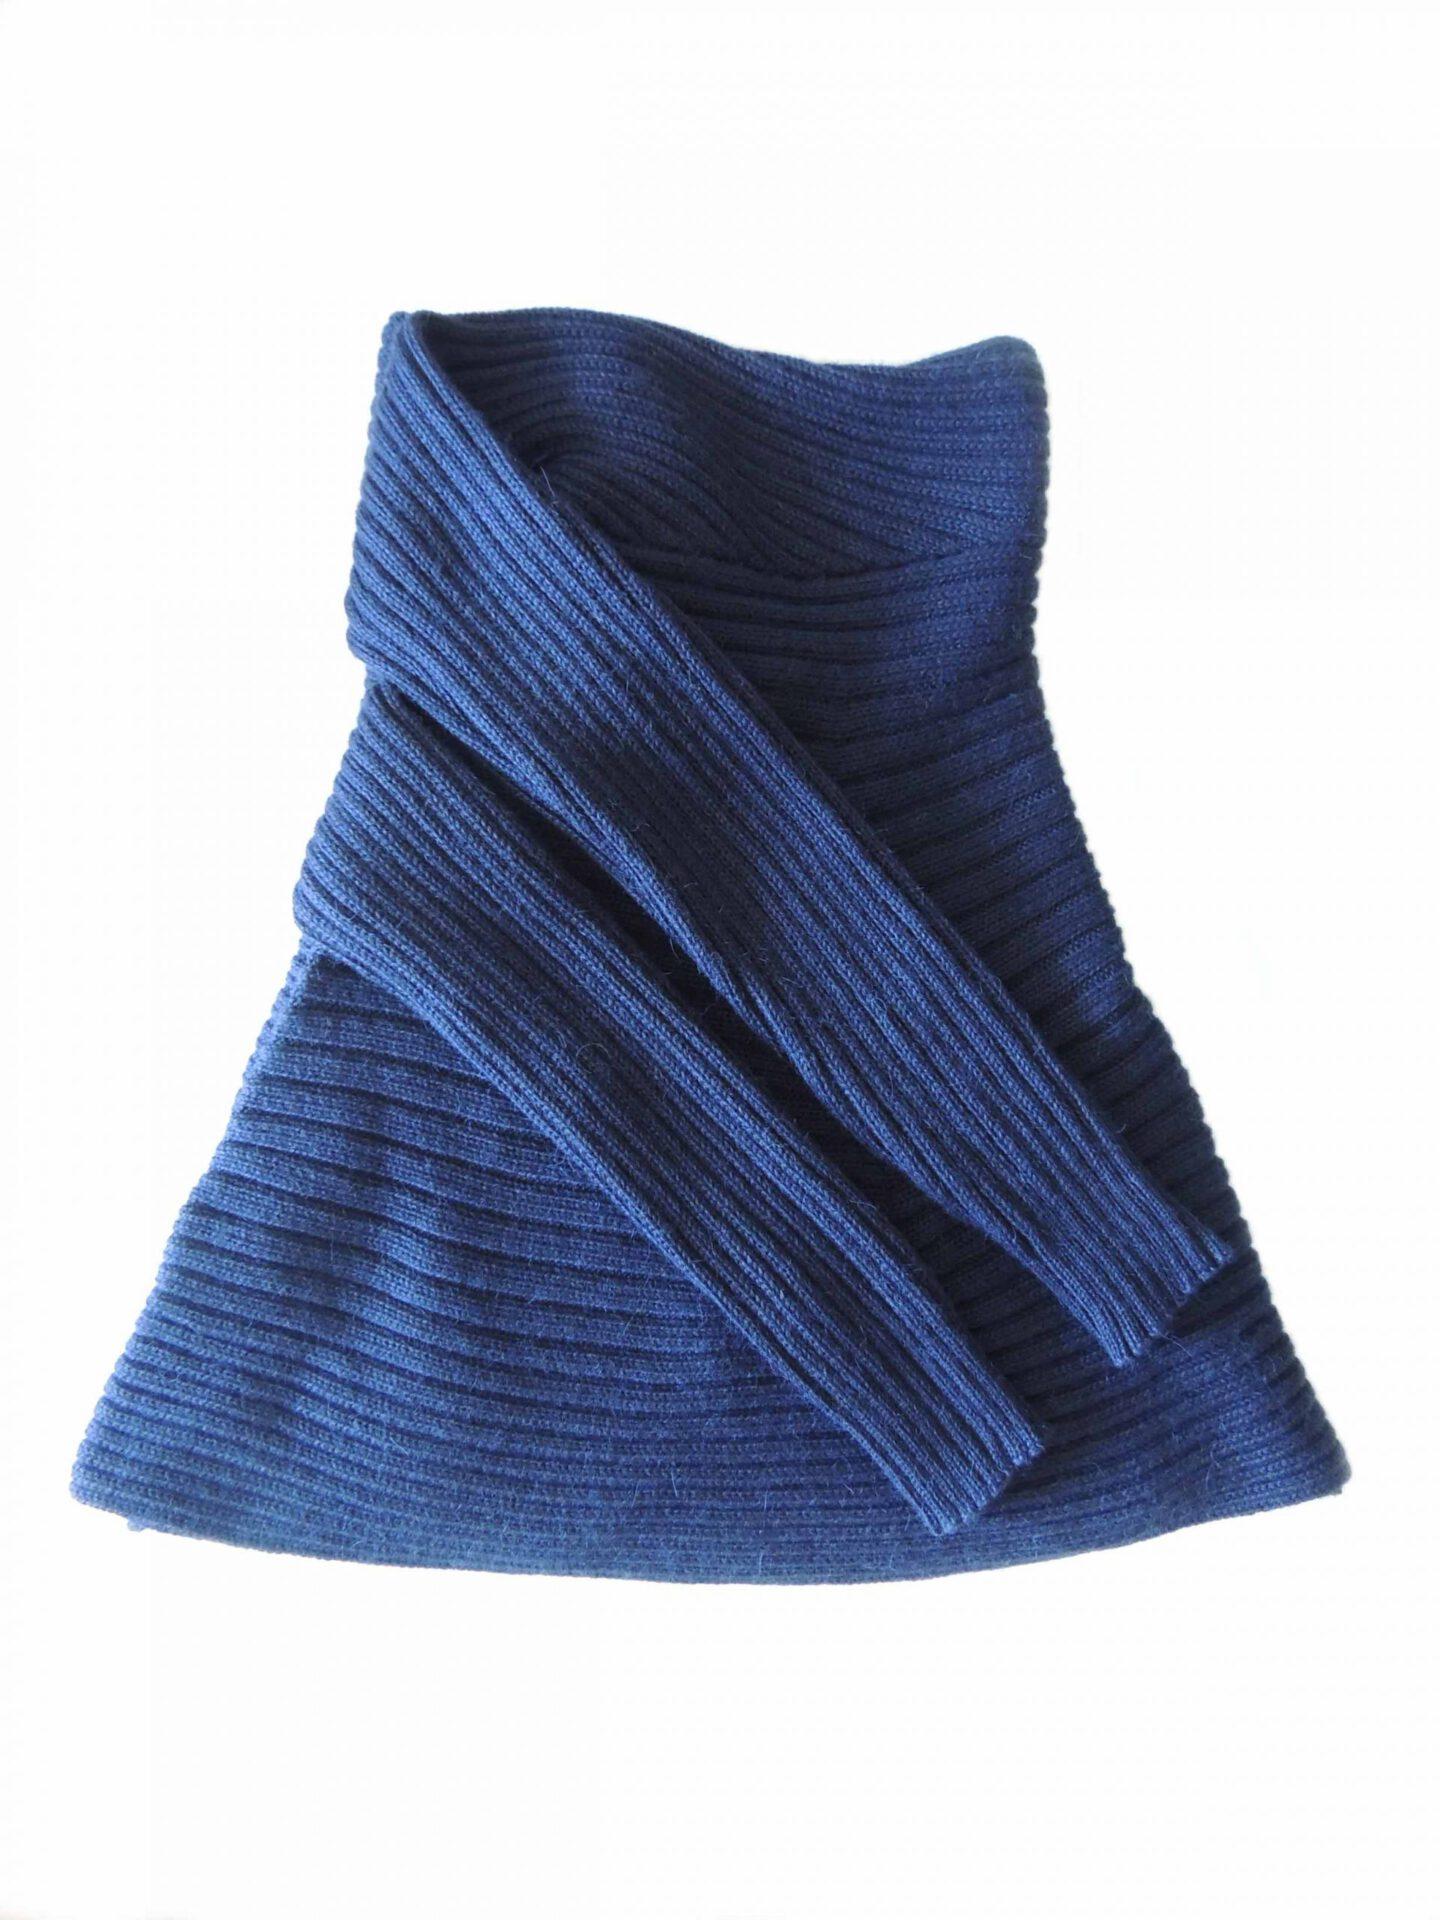 PFL Full knitted open cardigan model Keyla, in a soft alpaca blend, blue